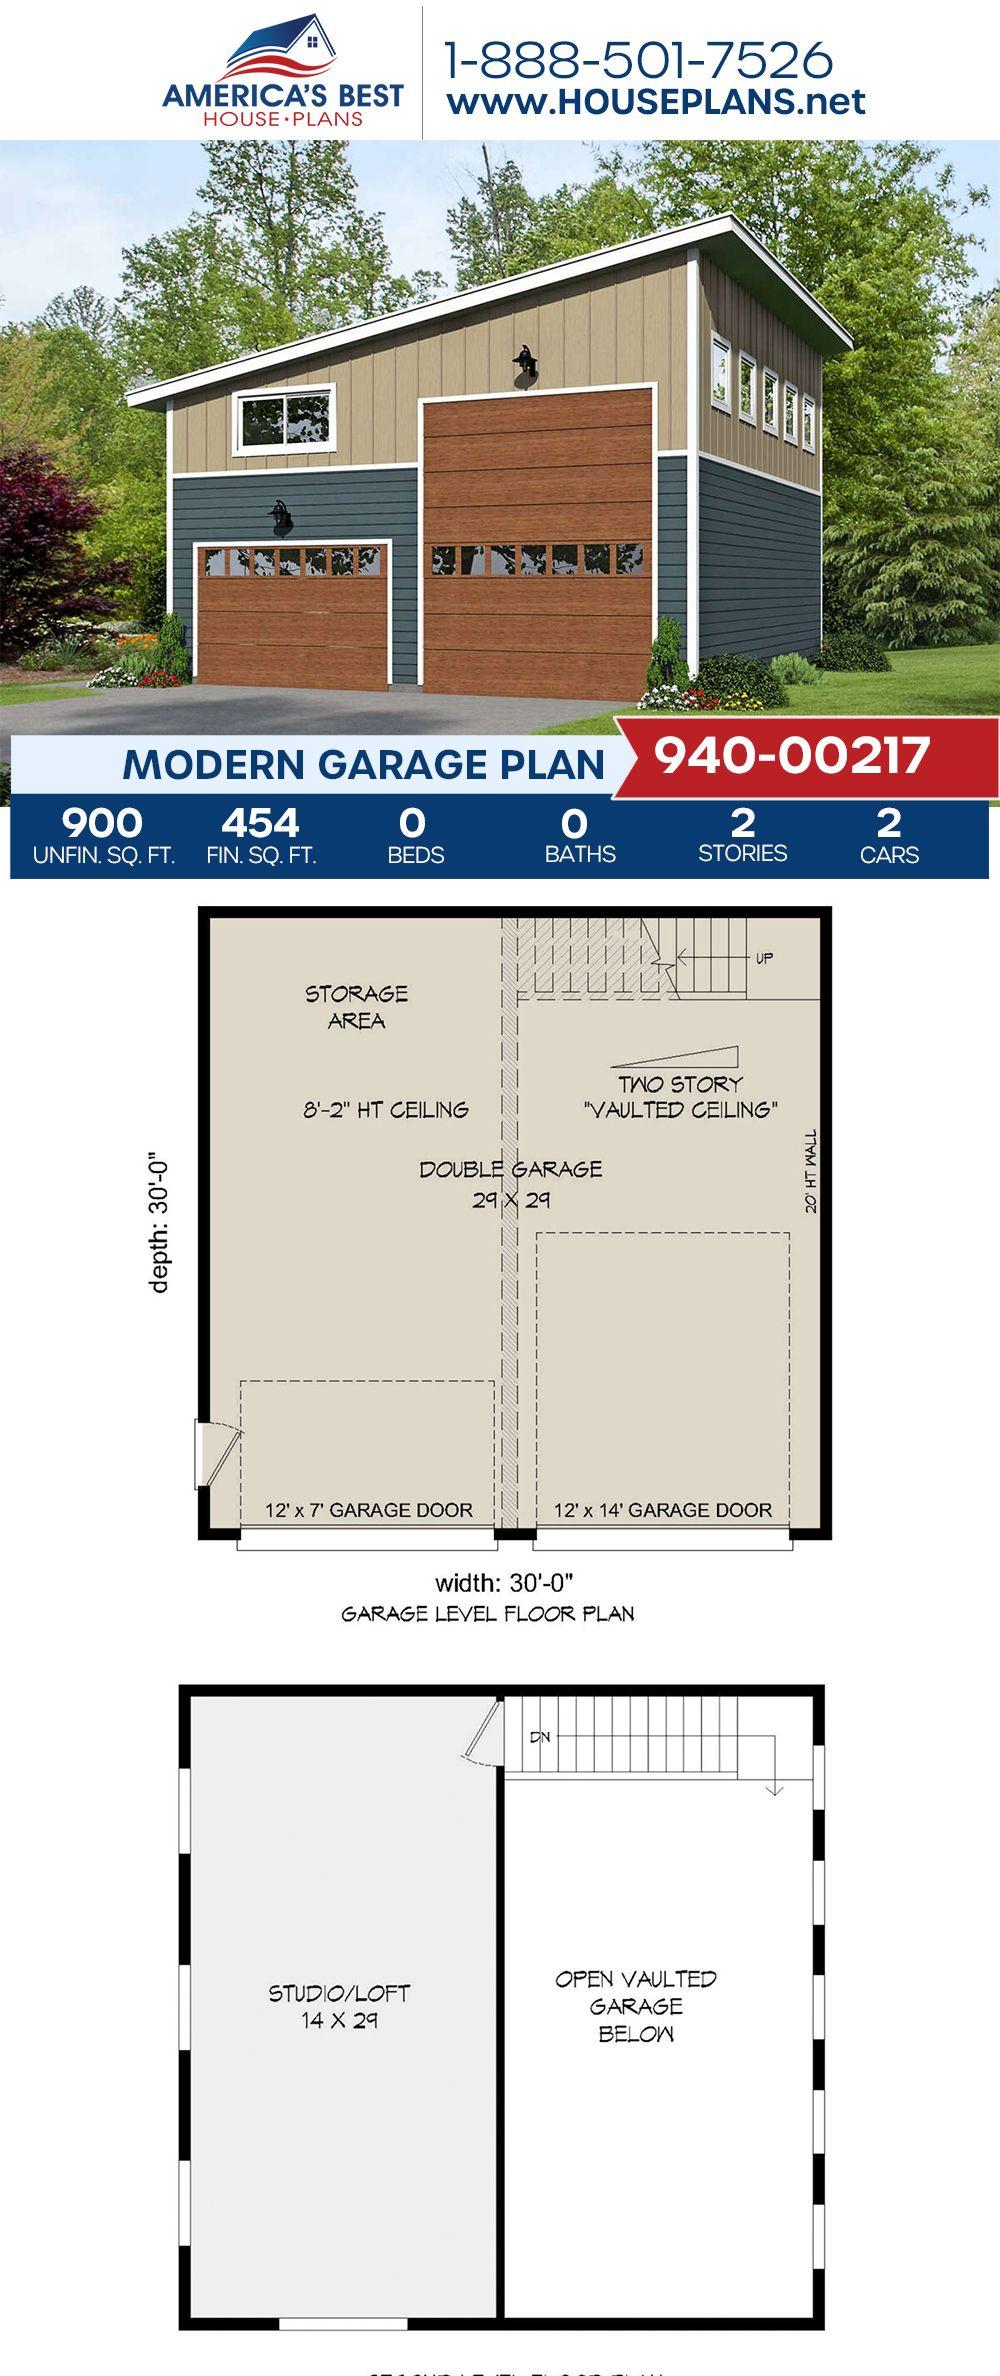 House Plan 940 00217 Modern Plan 454 Square Feet House Plans Modern House Plans Modern Garage